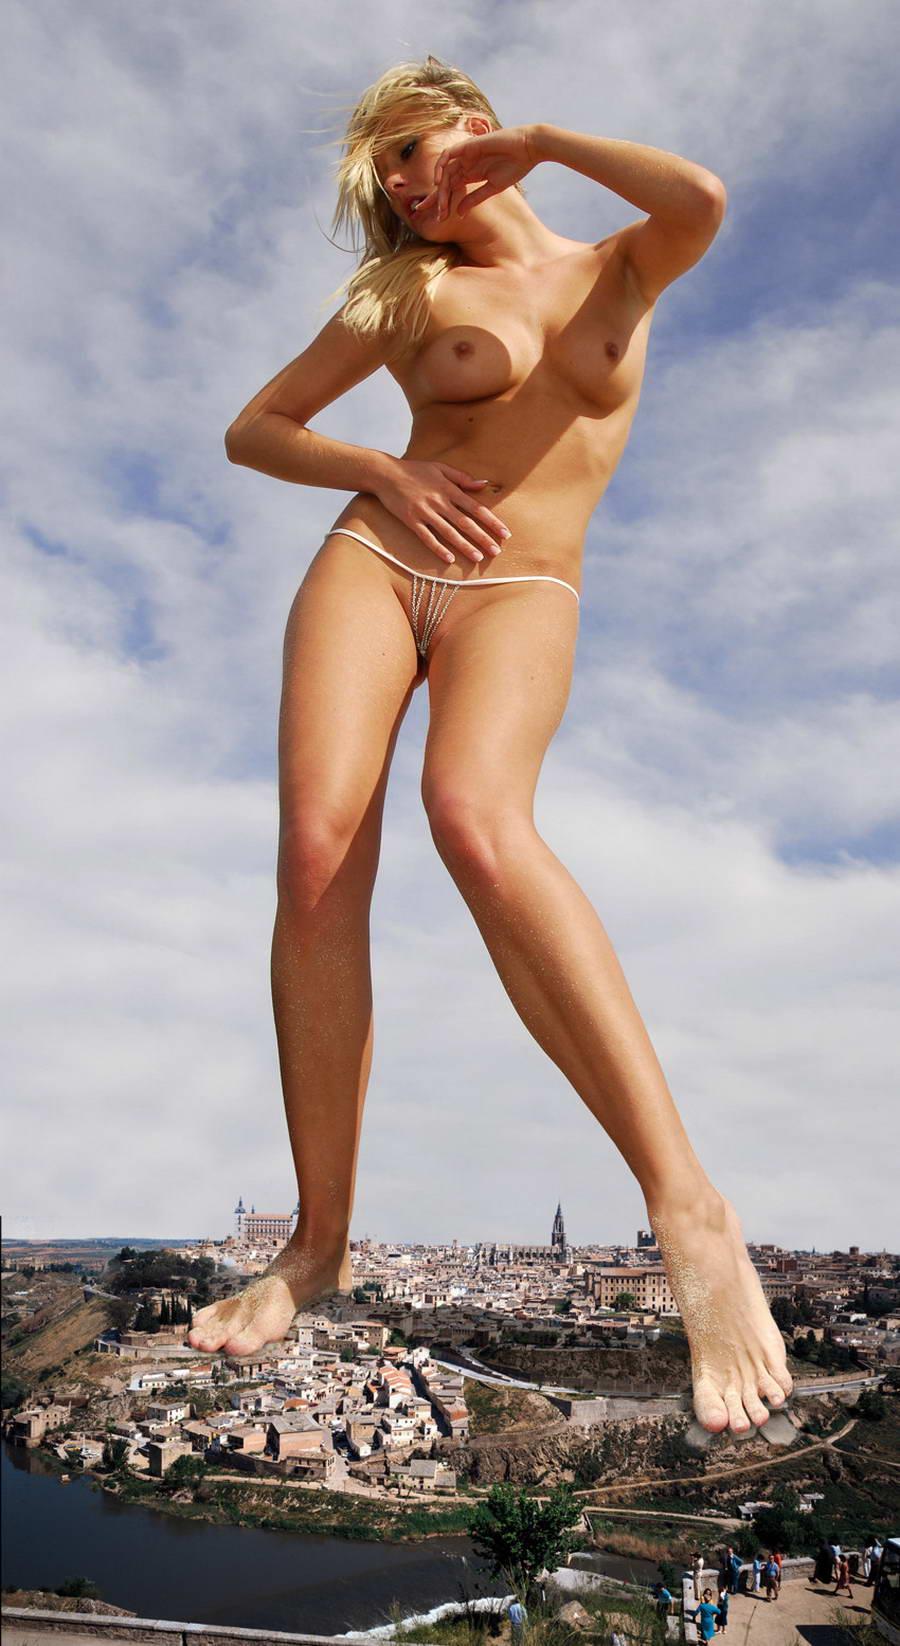 Giantess rene